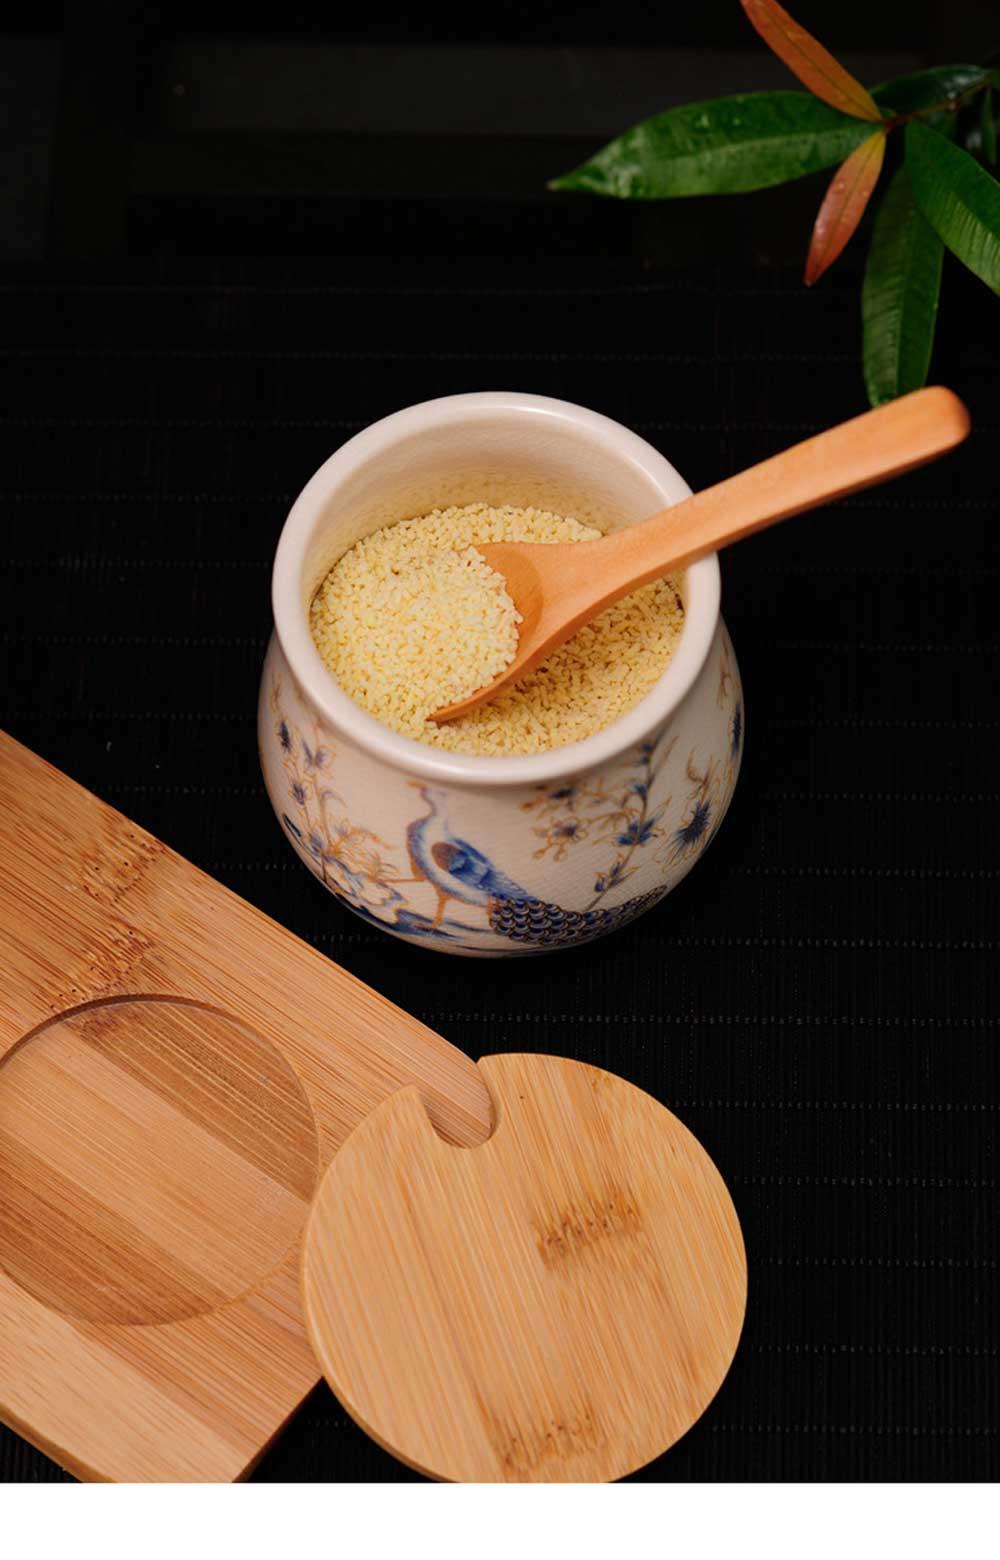 Three-piece Ceramic Seasoning Jar Set, Bamboo and Wood Ceramic Seasoning Bottle Set, with Wood Bracket 10